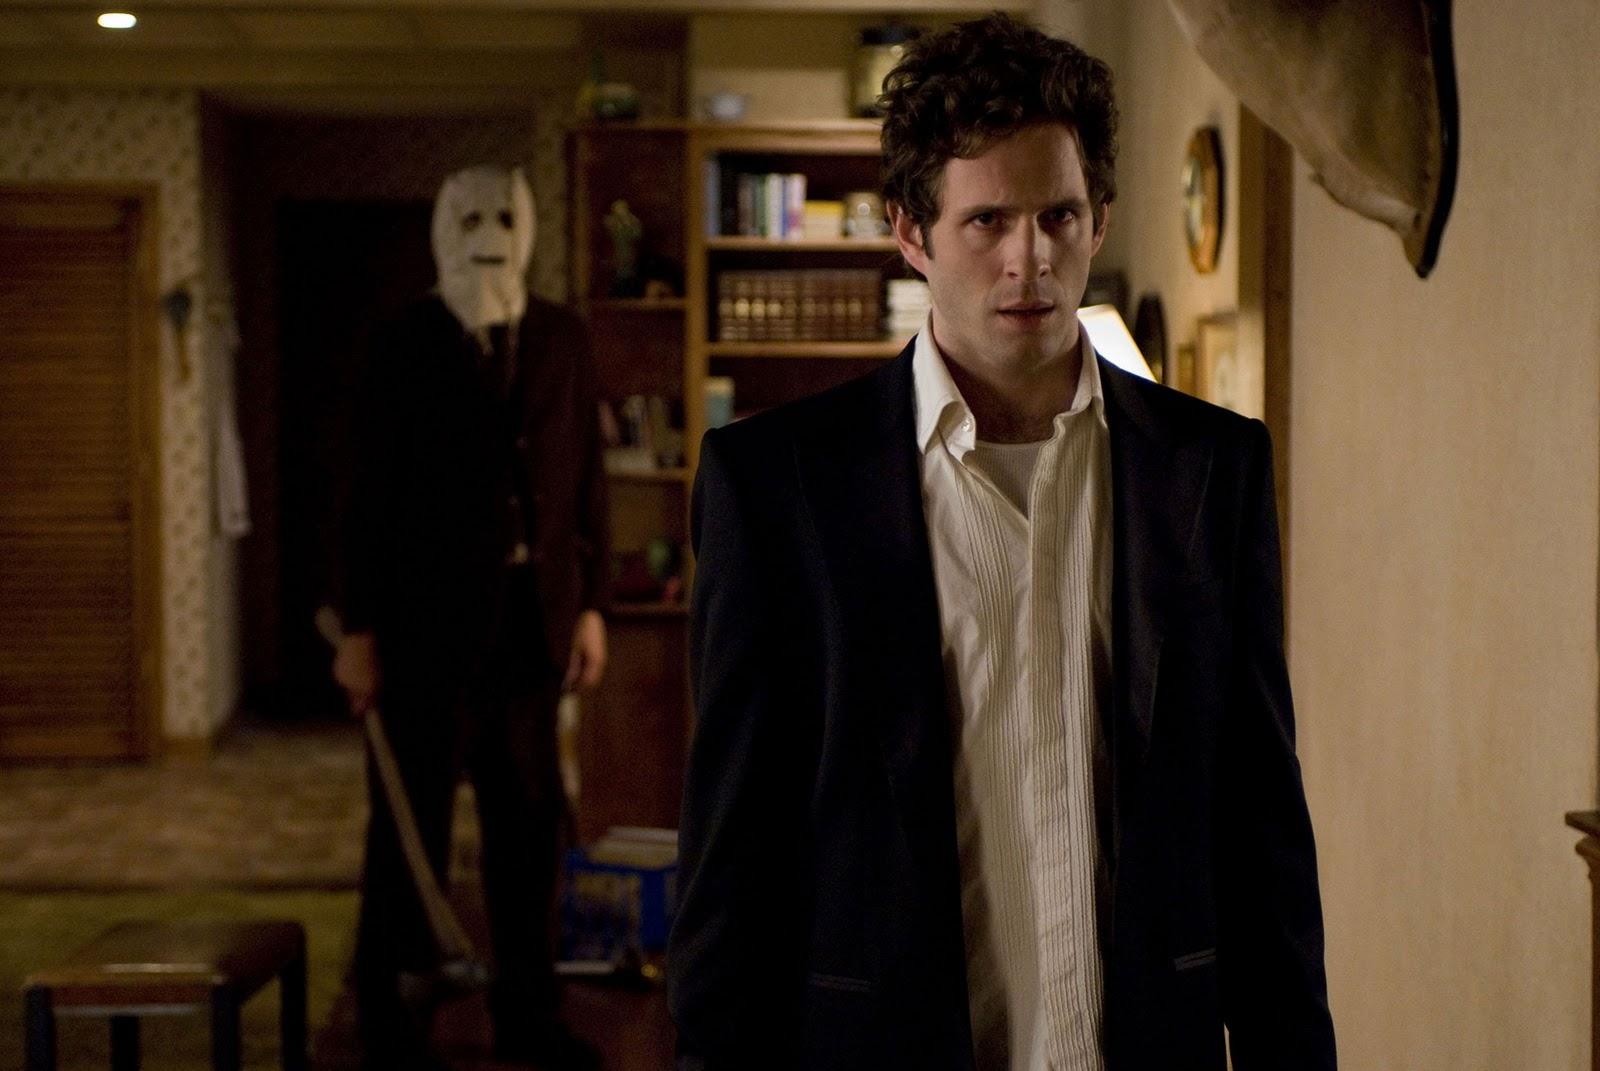 Незнакомцы, Незнакомцы 2, The Strangers, The Strangers 2, фильм ужасов, хоррор, триллер, horror, thriller